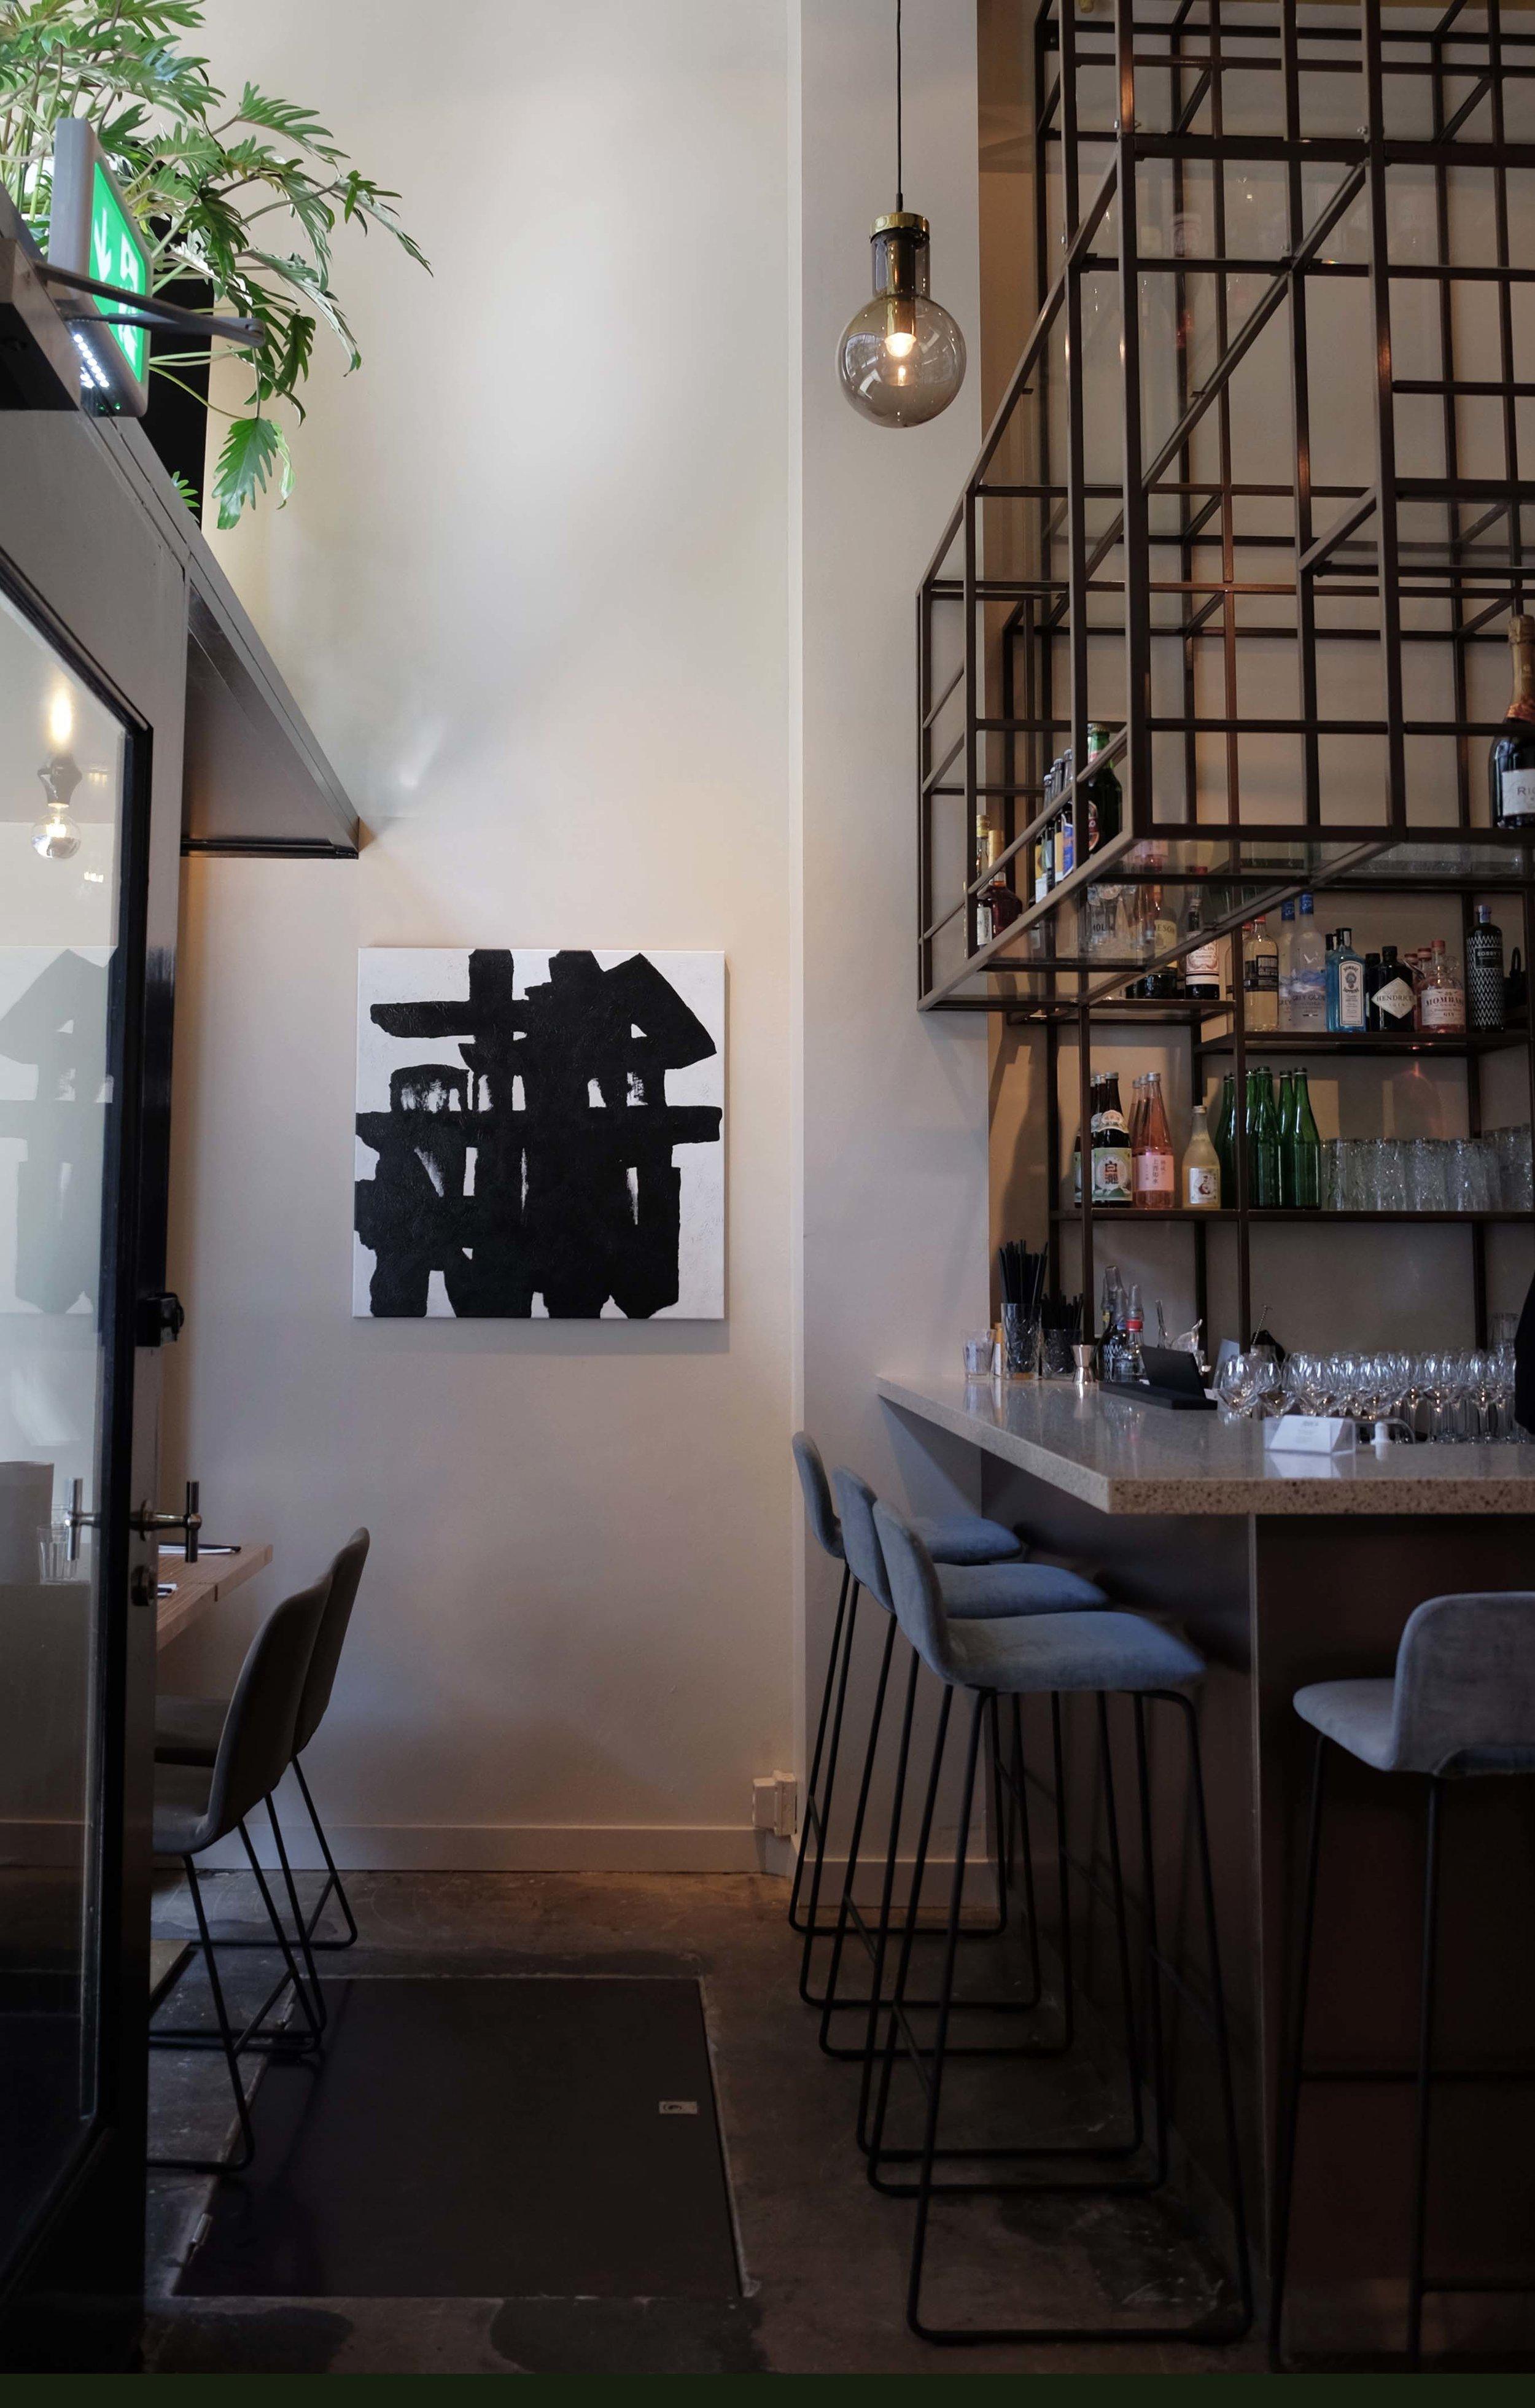 Restaurant Nooch Rotterdam westewagenstraat 56 lex de gooijer interiors 016.jpg